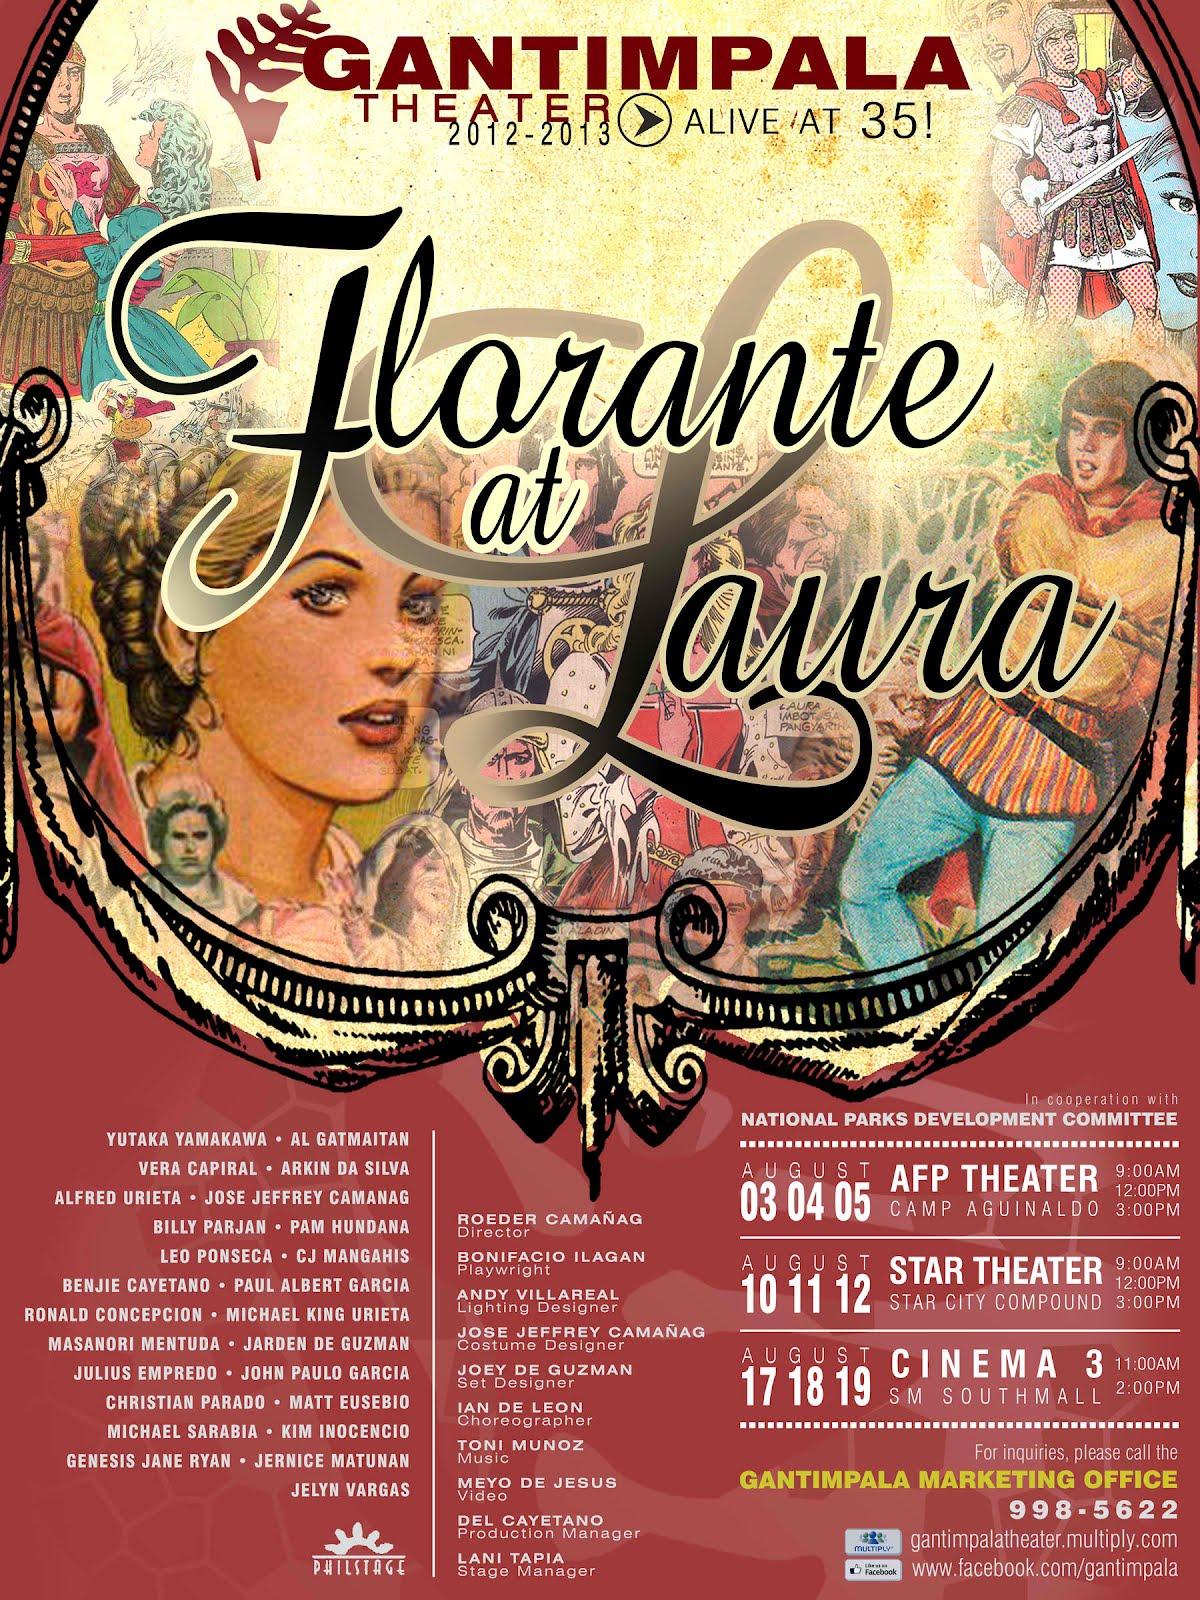 Laura download at florante ebook